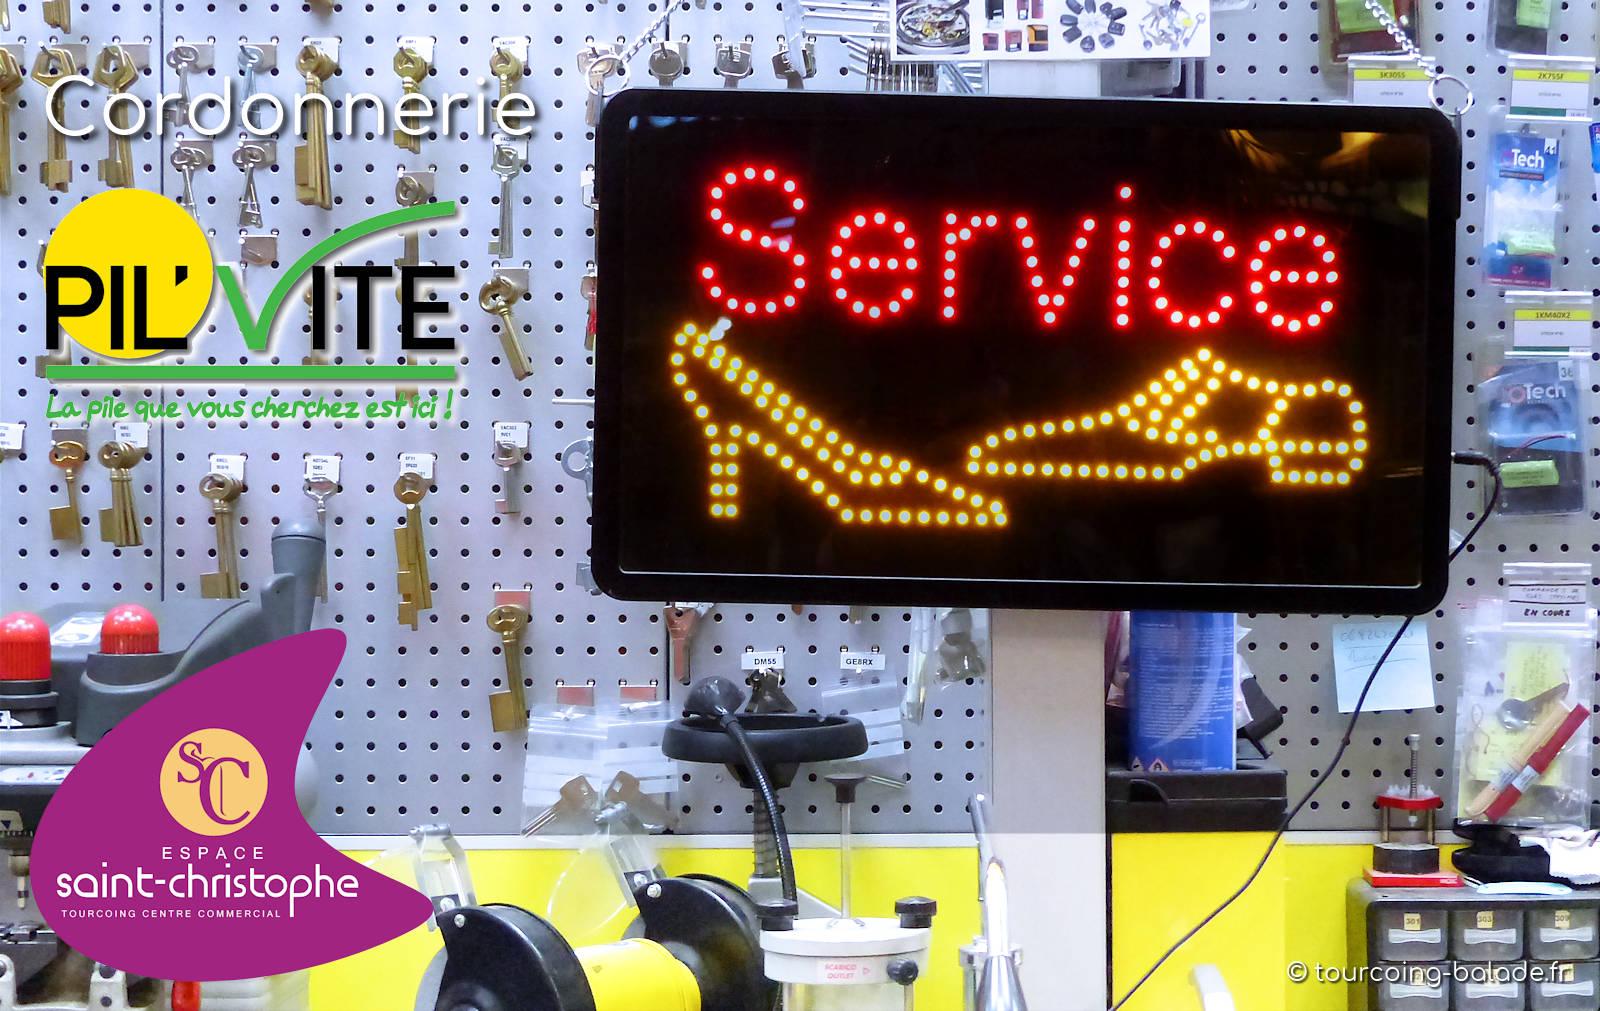 Cordonnier Tourcoing - Pil'Vite, Espace Saint-Christophe Tourcoing